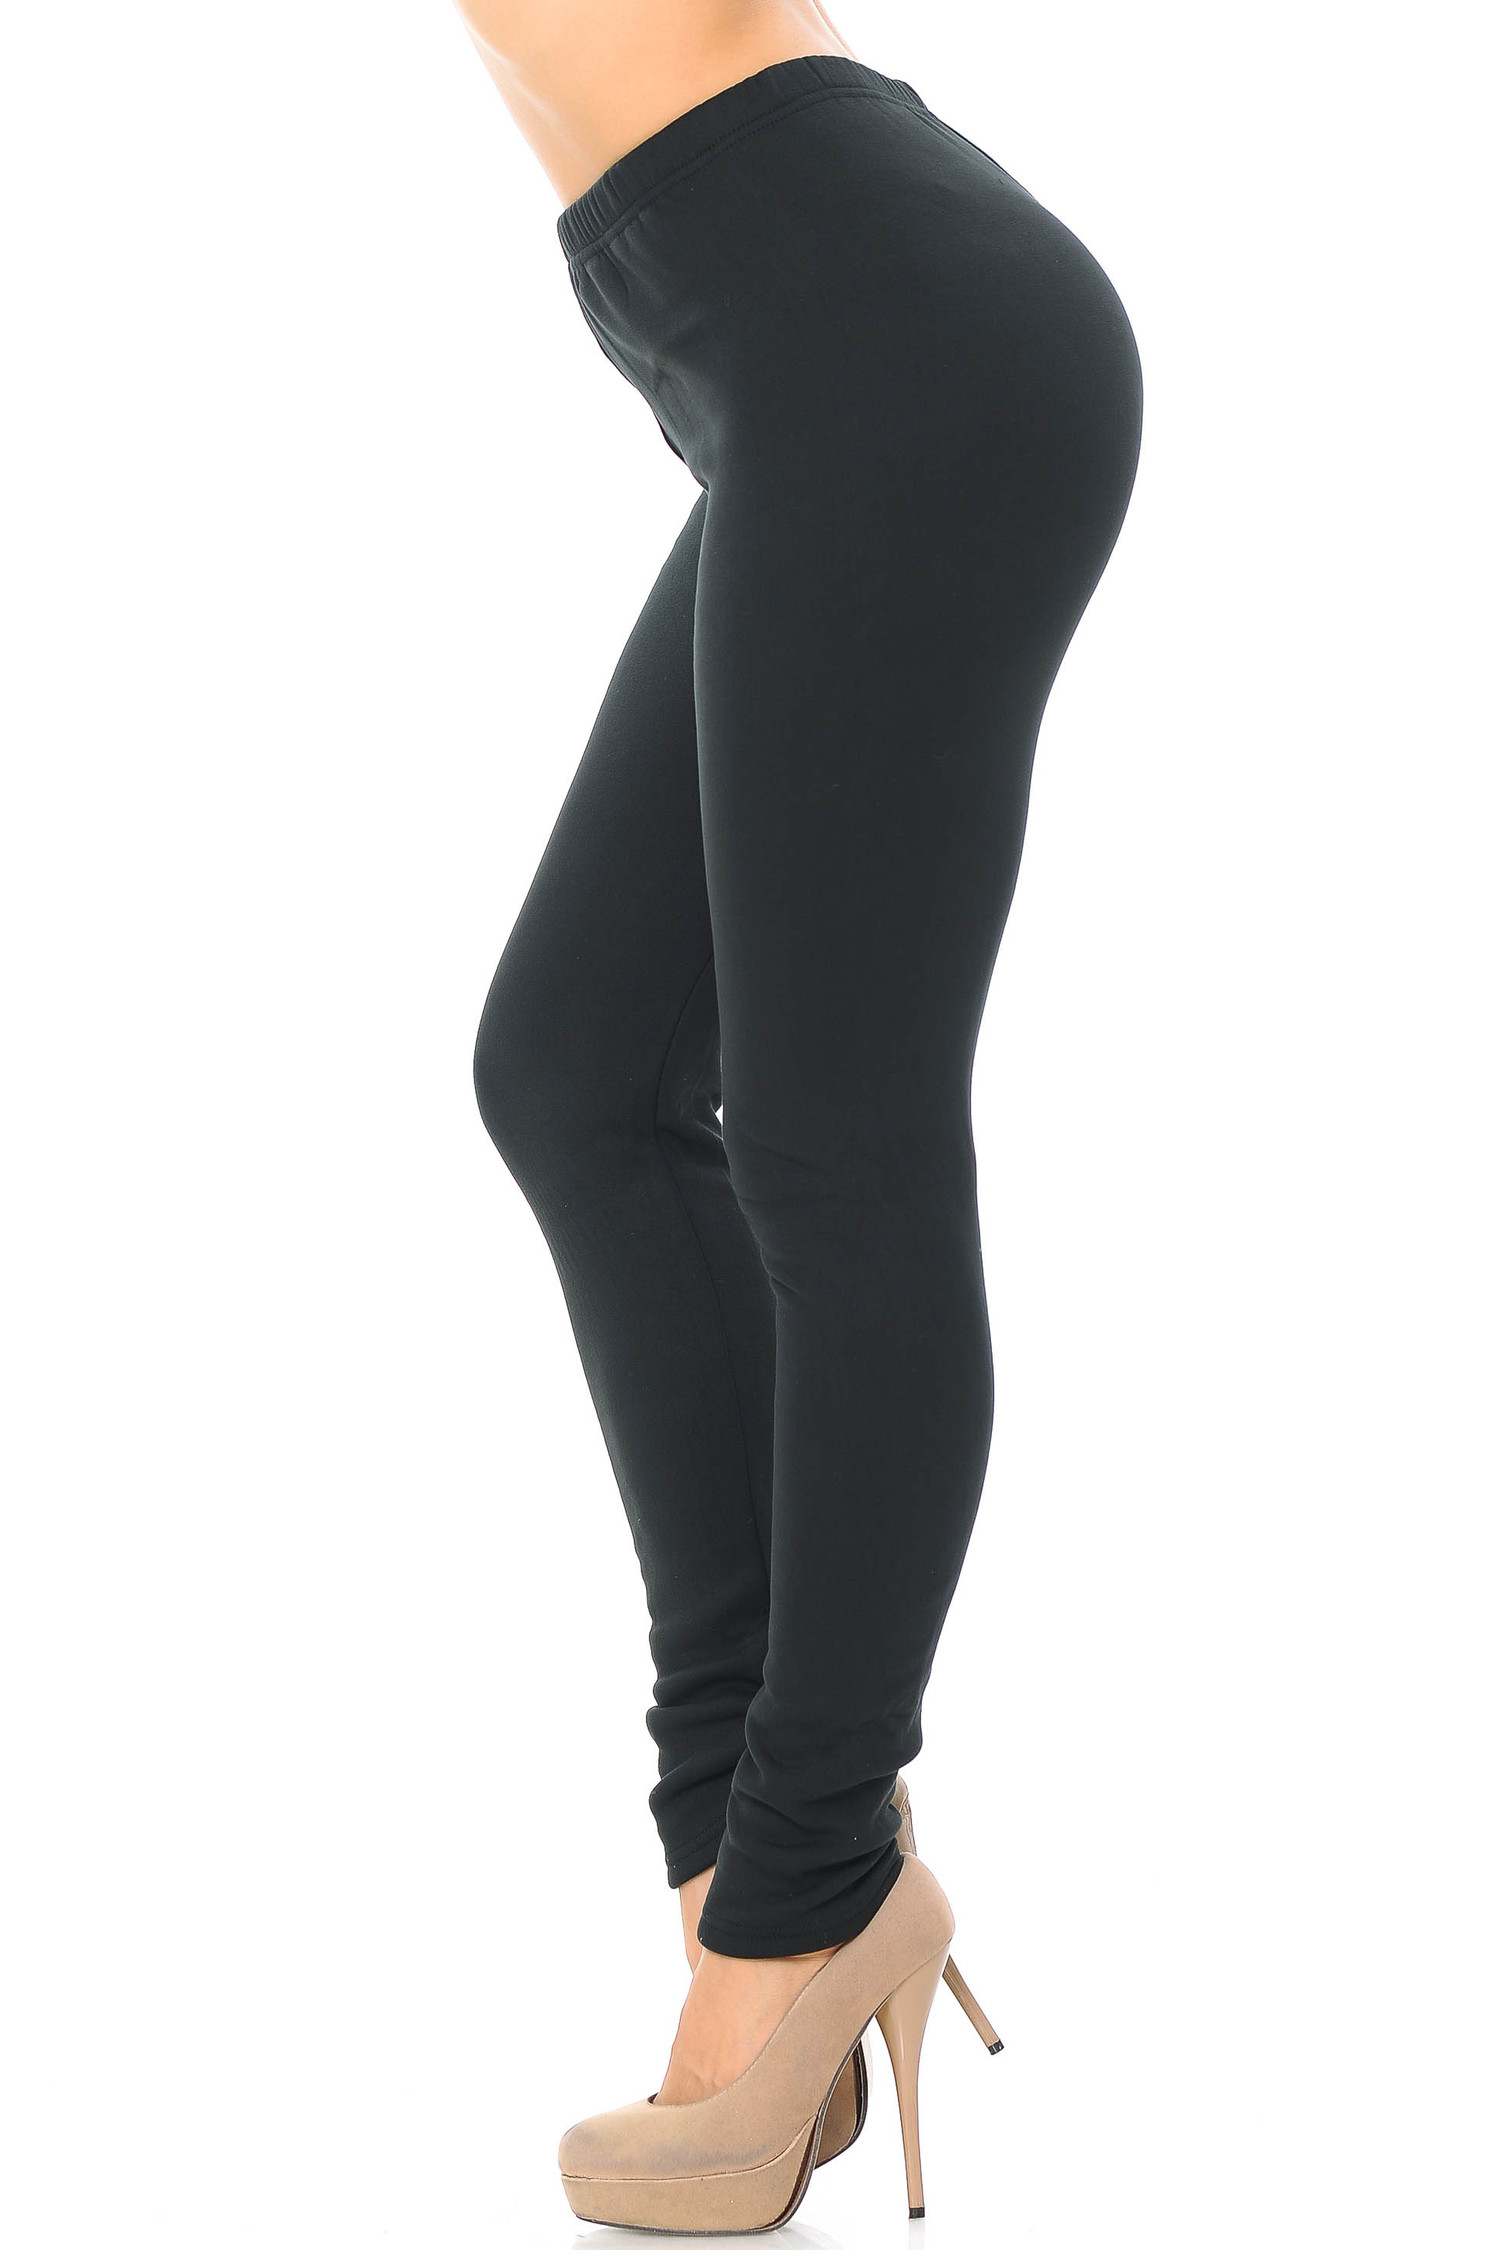 Left side of Creamy Soft Fleece Lined Plus Size Leggings - USA Fashion™